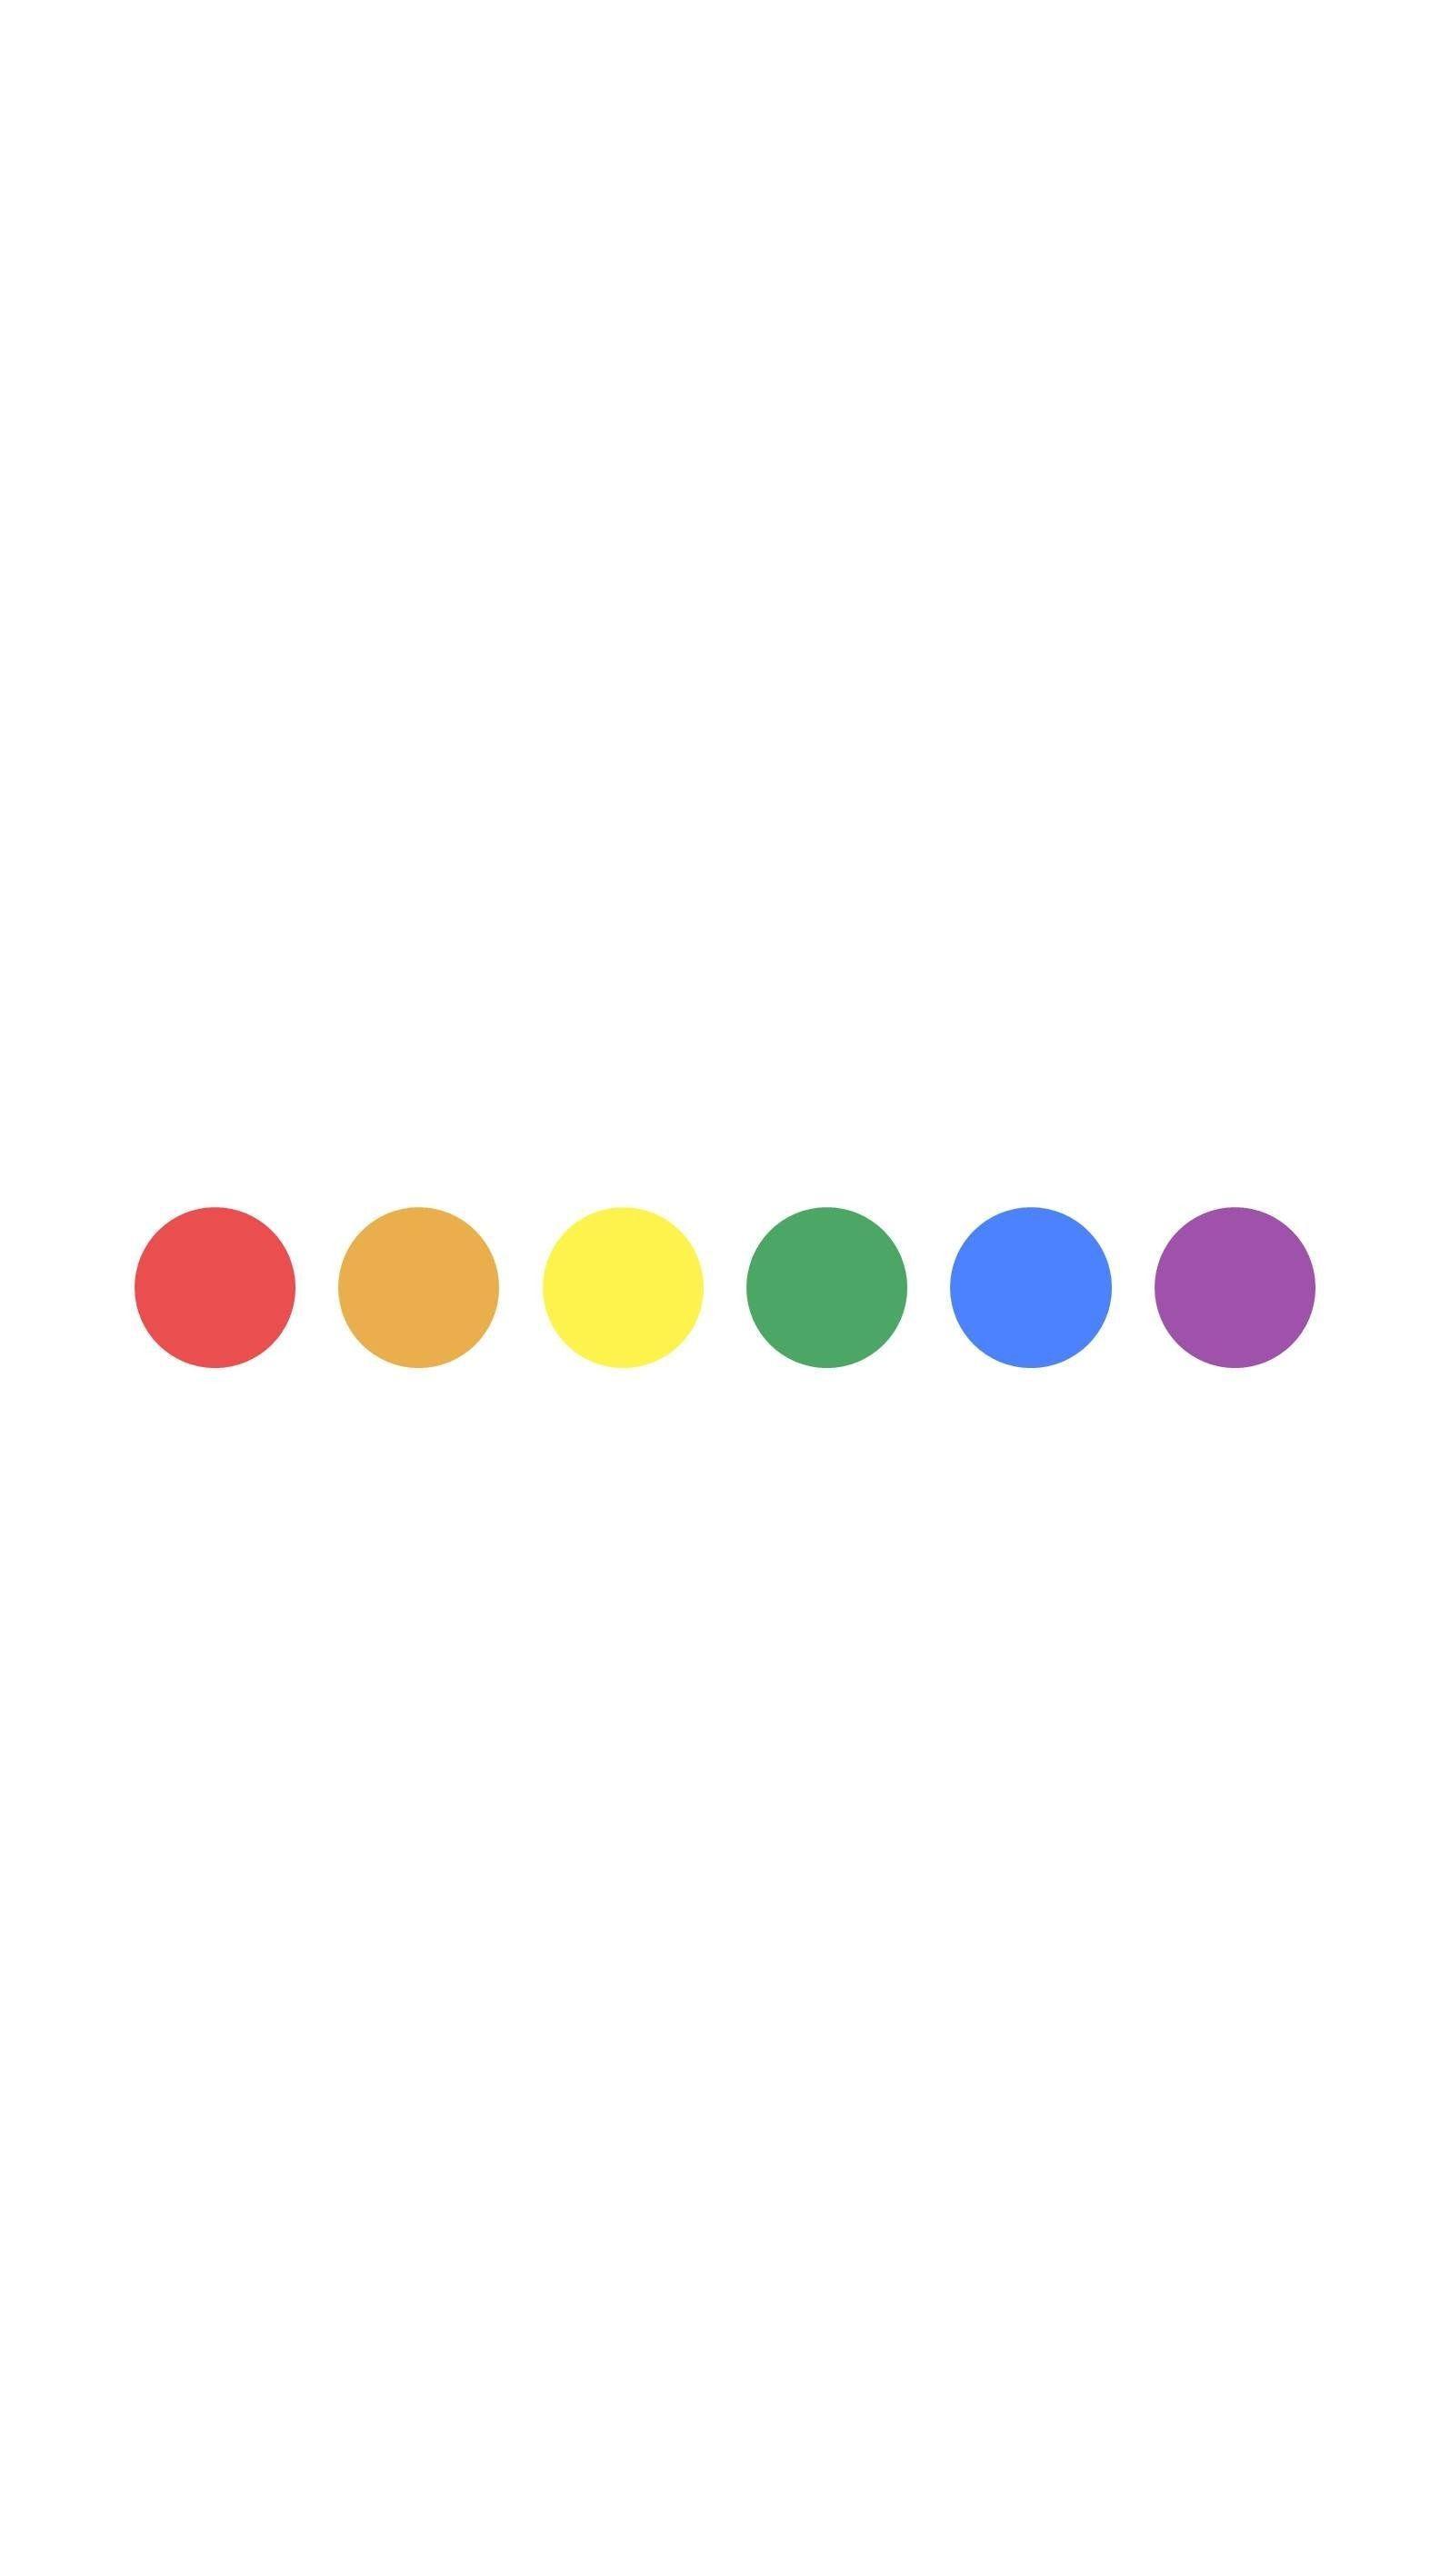 LGBT Pride Wallpapers - Top Free LGBT Pride Backgrounds ...